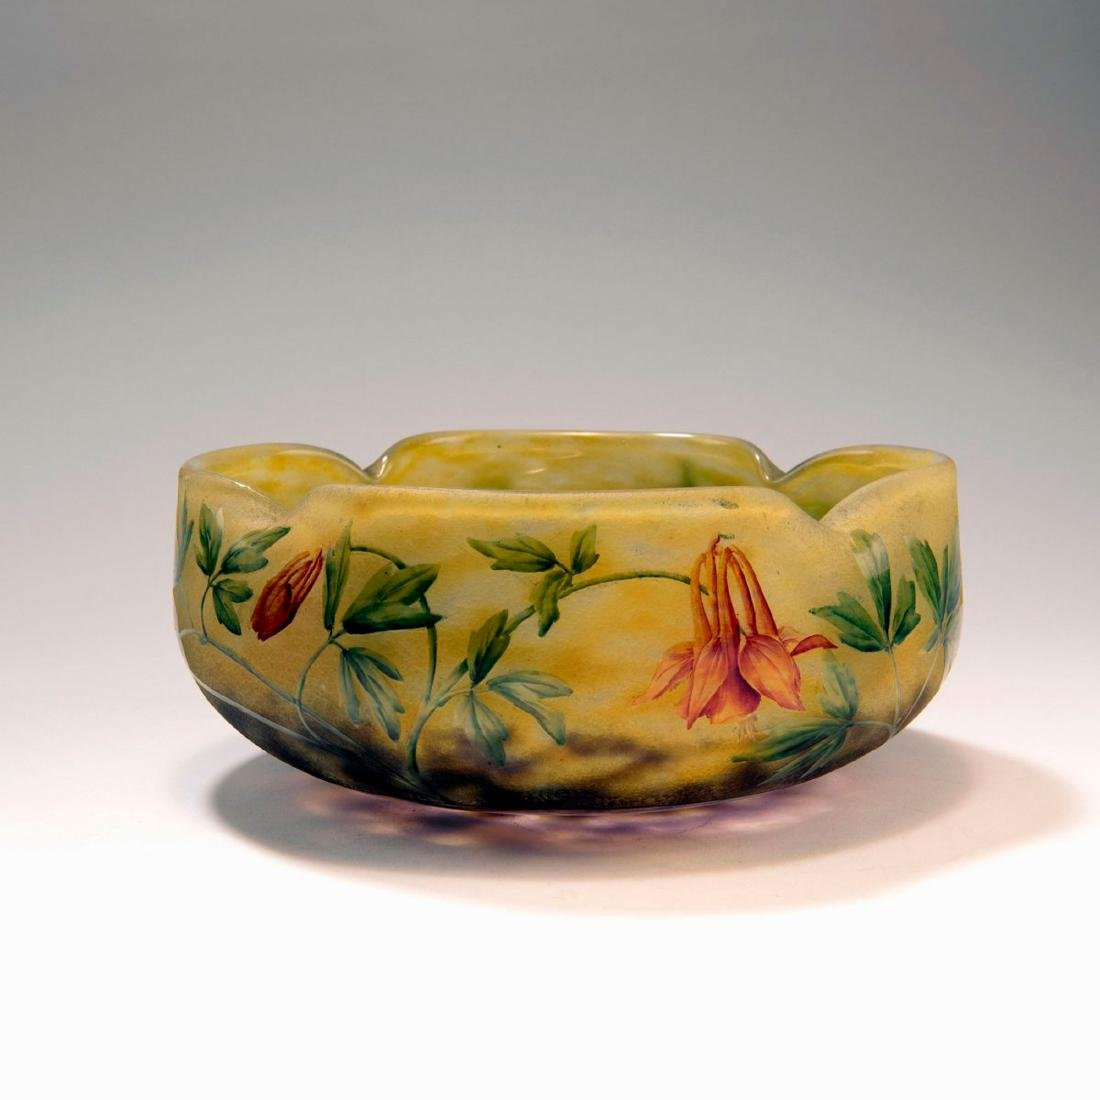 'Ancolies' bowl, c. 1910